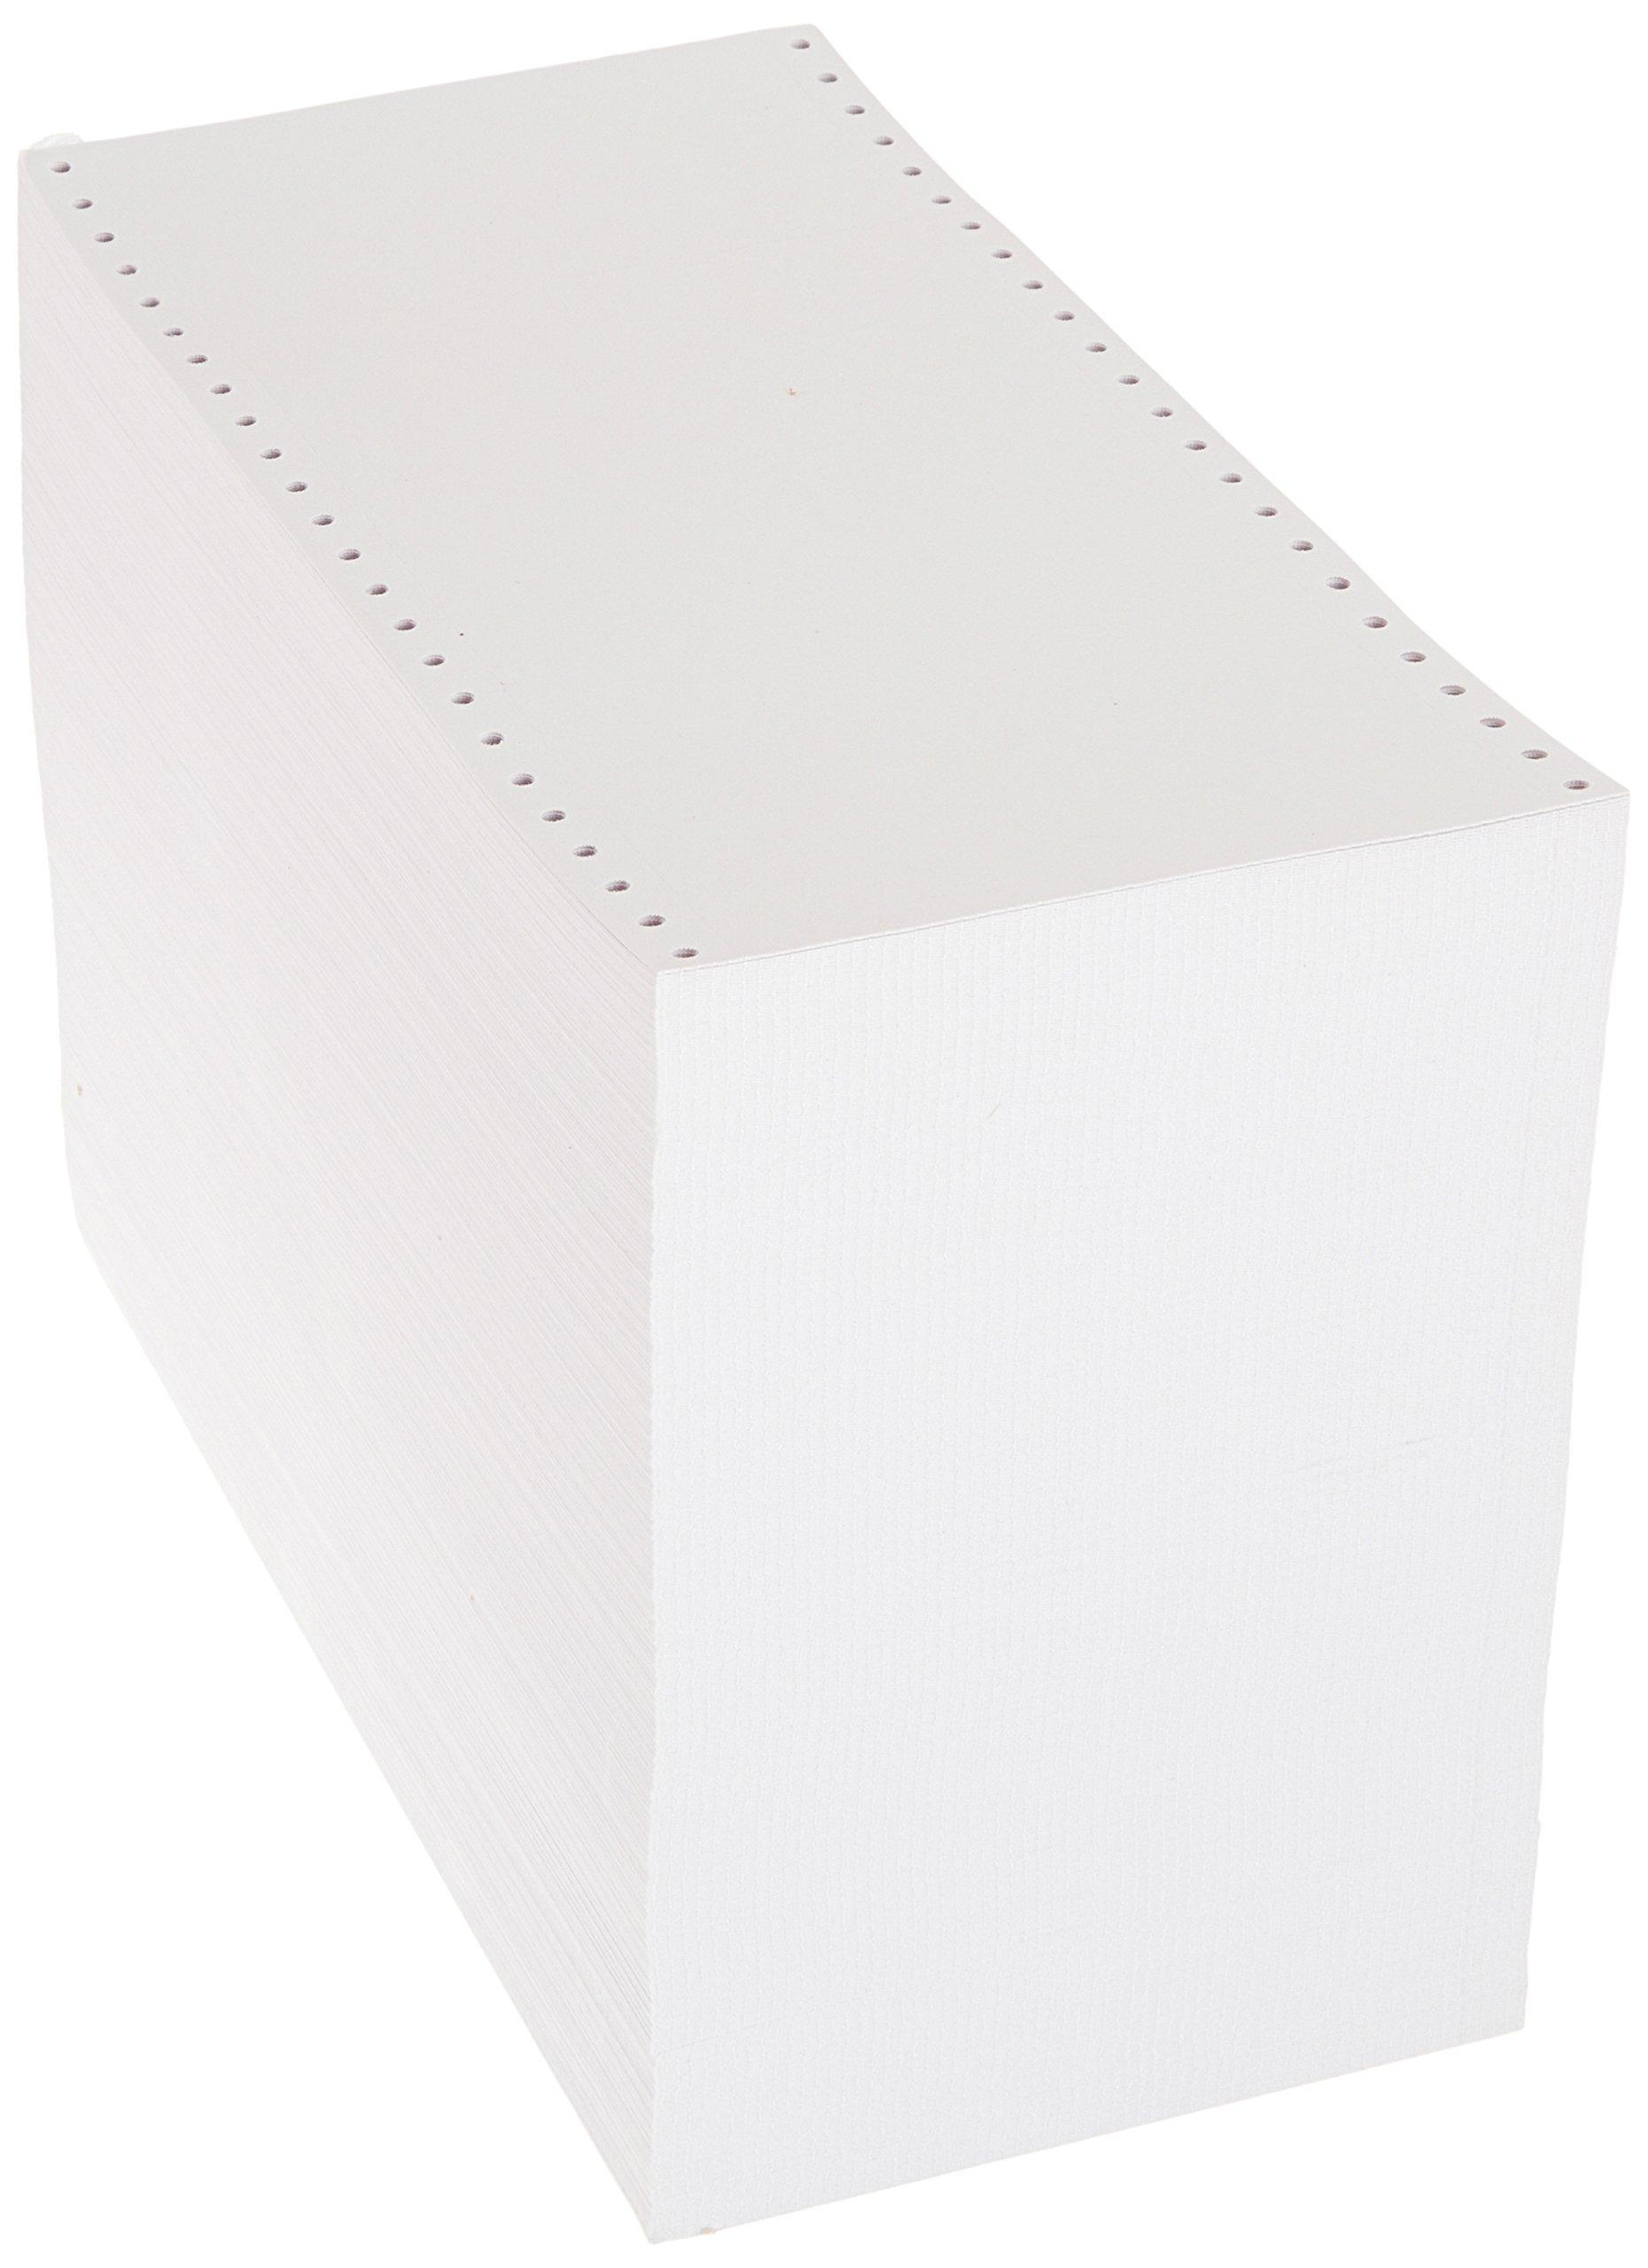 Sparco Printable Index Card, 3 x 5